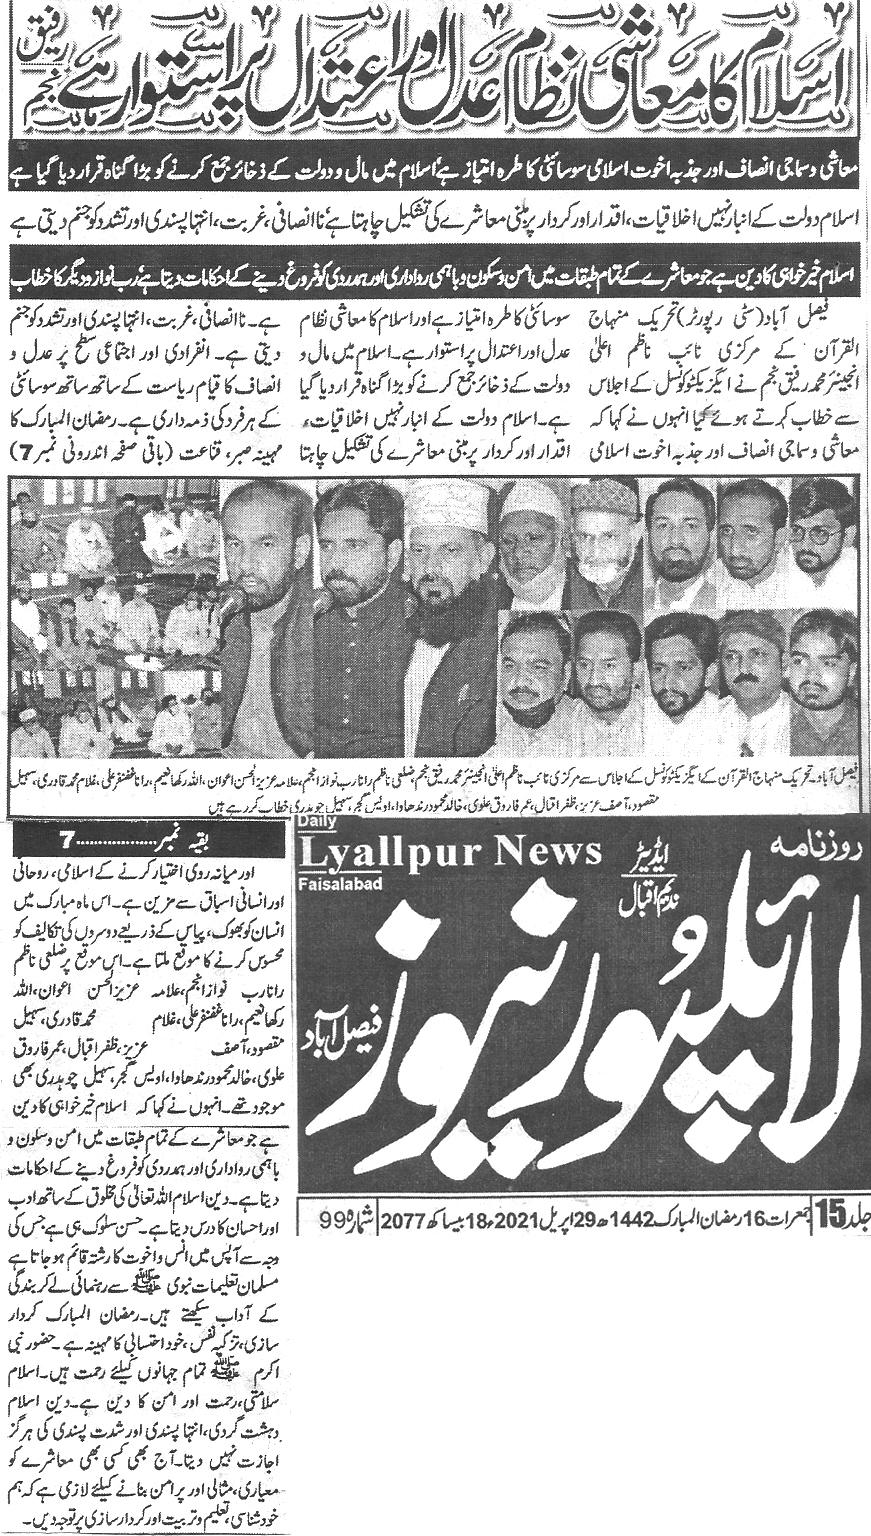 Minhaj-ul-Quran  Print Media Coverage Daily Lyallpur News Back page